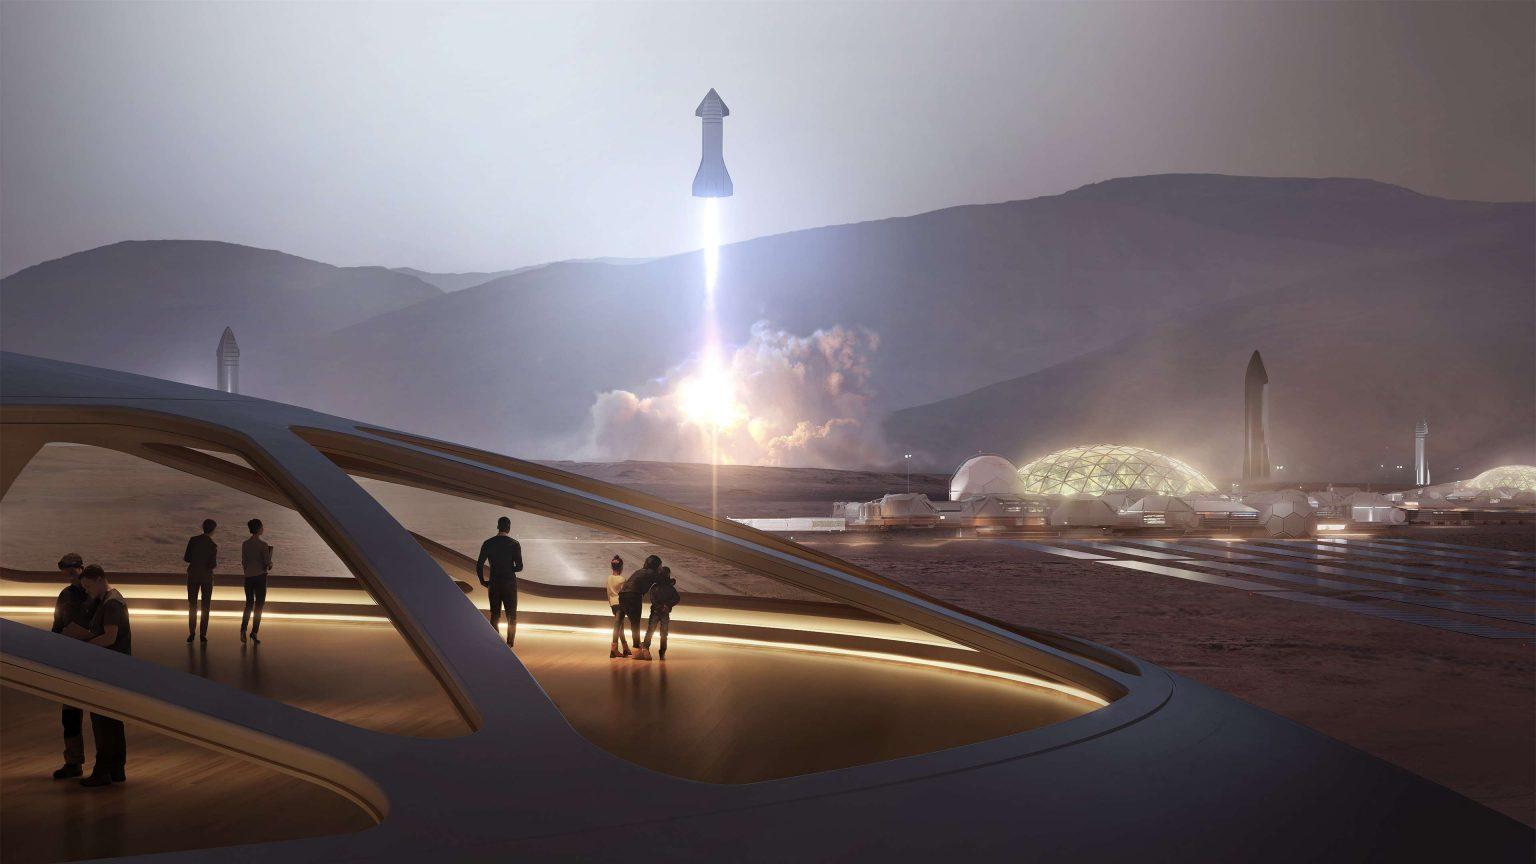 https://www.computerra.ru/wp-content/uploads/2020/03/Starship-2019-Mars-base-interior-render-SpaceX-1-c-1536x864.jpg